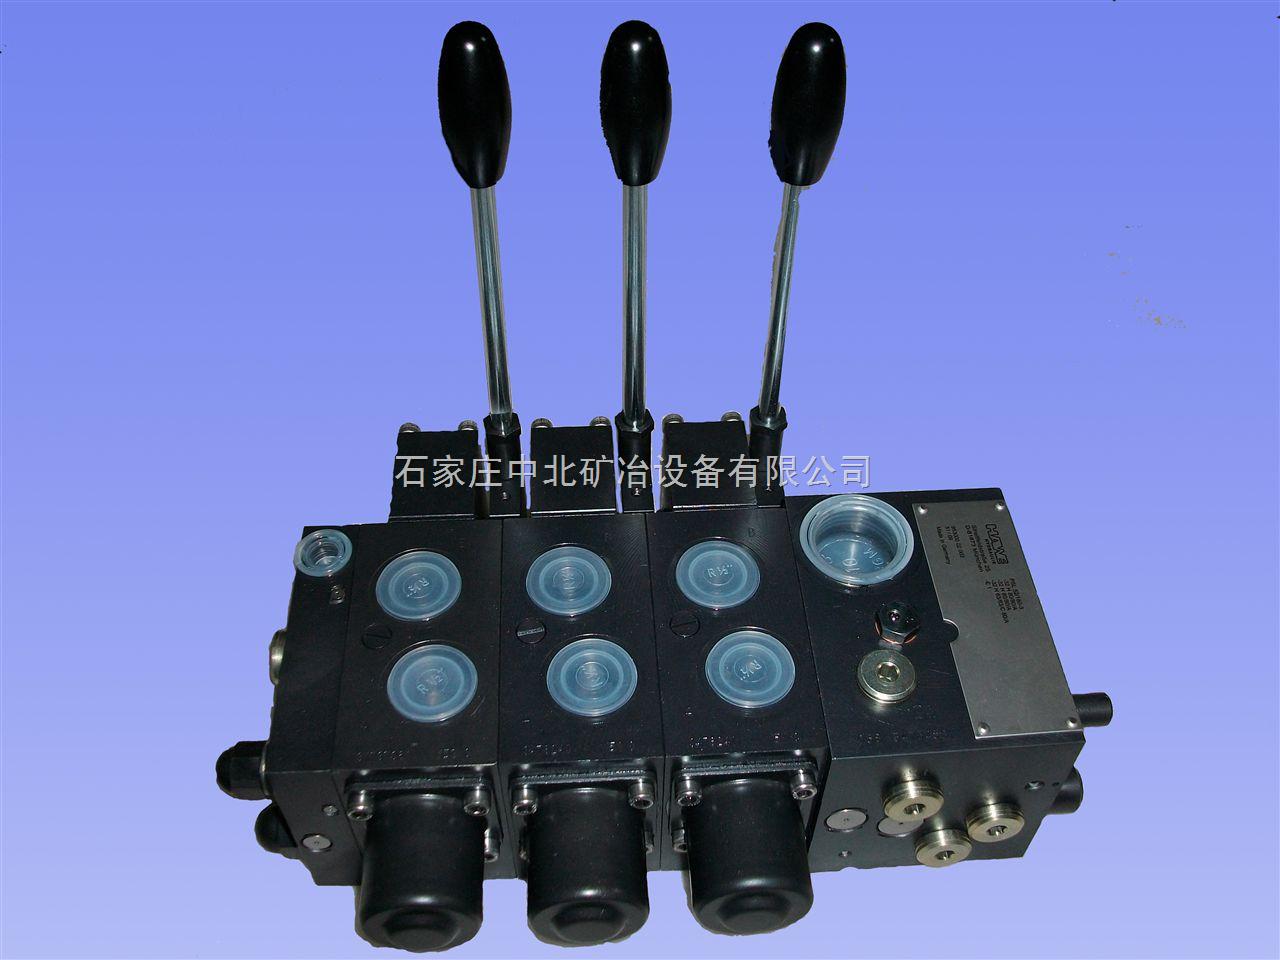 HAWE哈威PSL5/160-3-3-E1三联多路换向阀